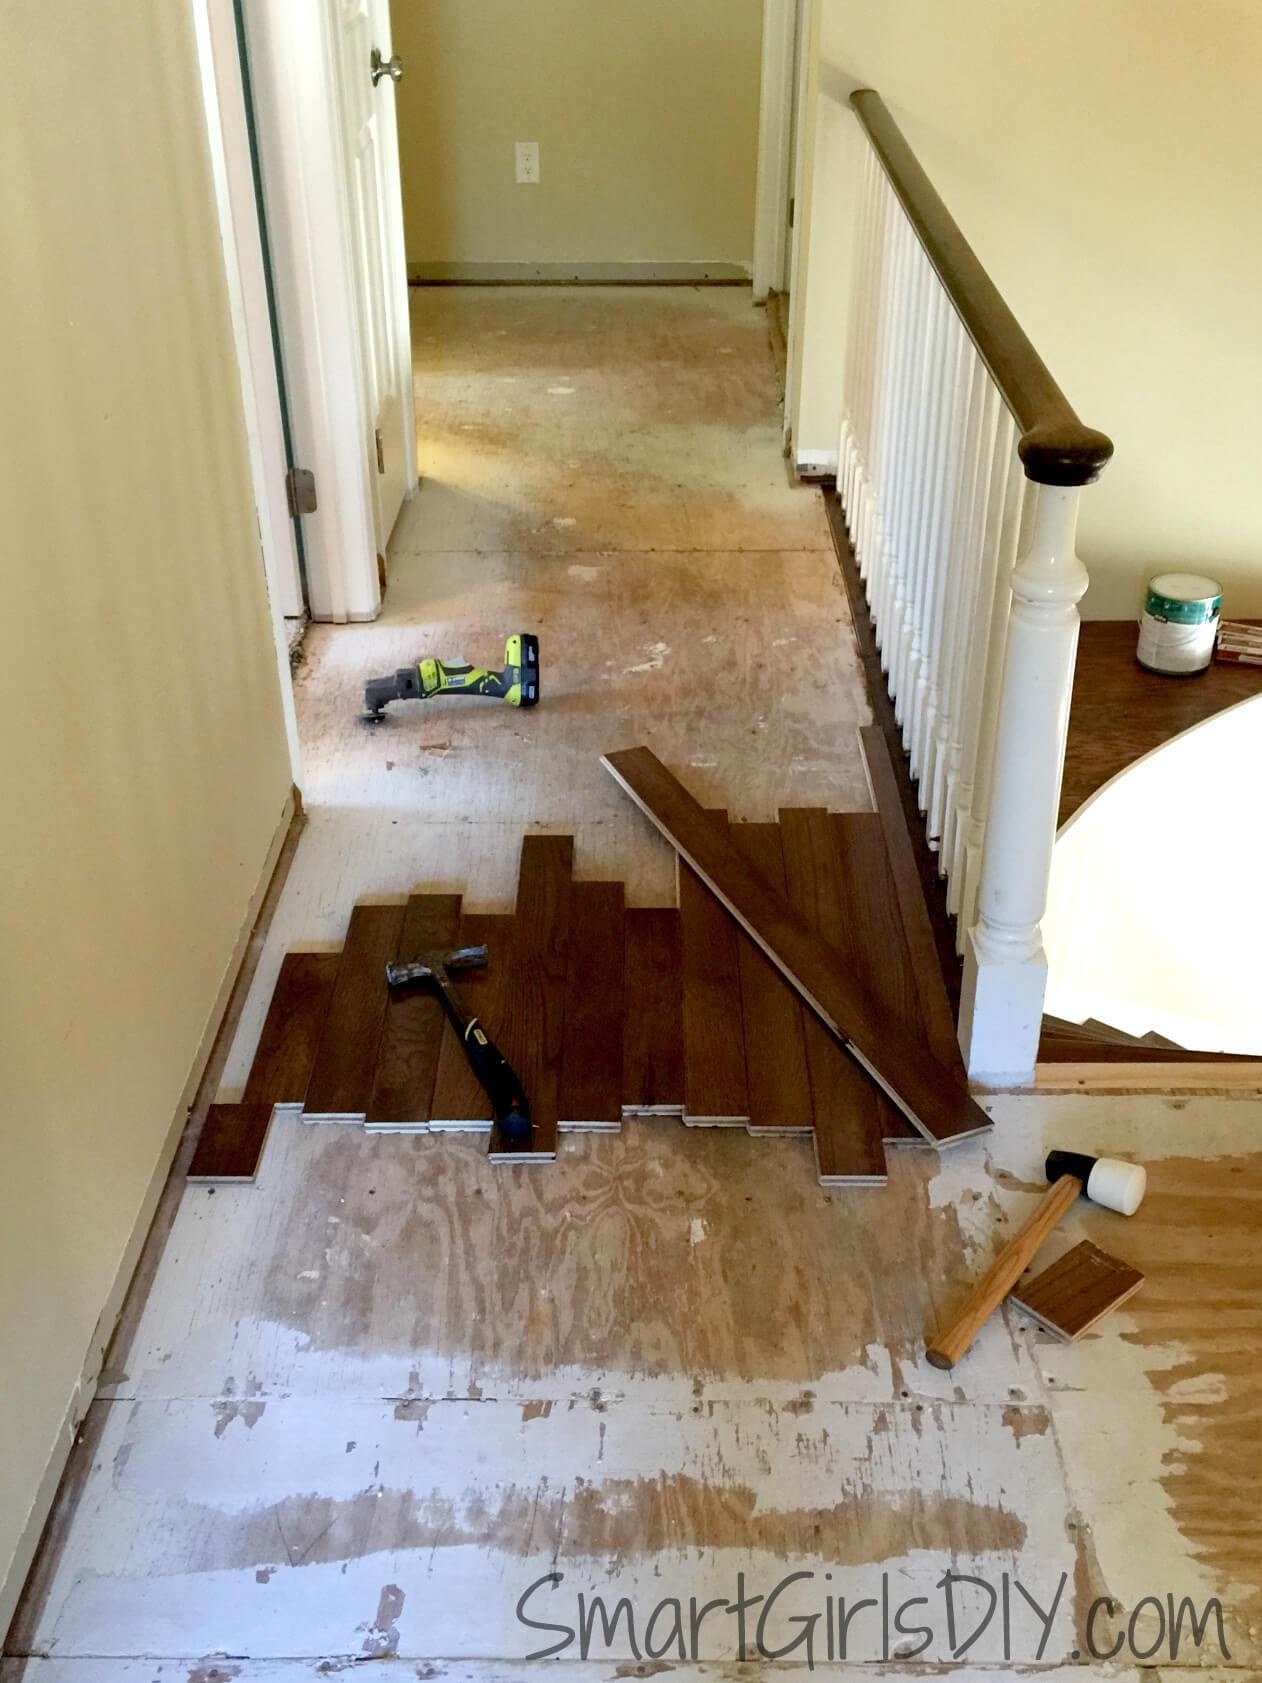 3 4 hardwood floor nailer of upstairs hallway 1 installing hardwood floors intended for laying out bruce hardwood flooring